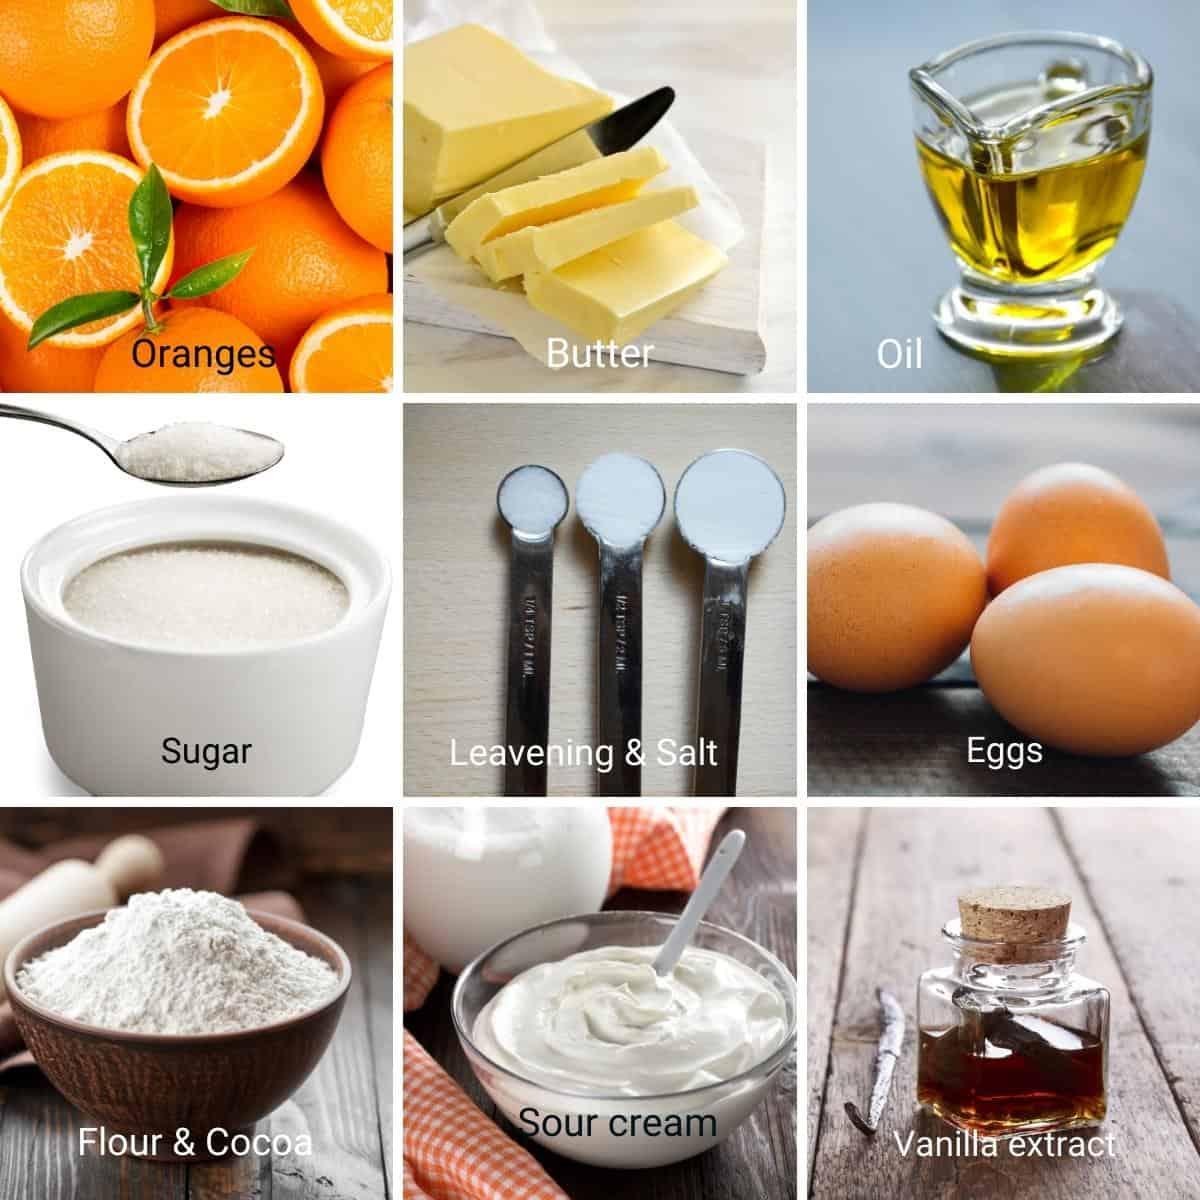 Ingredients for orange cake recipe.